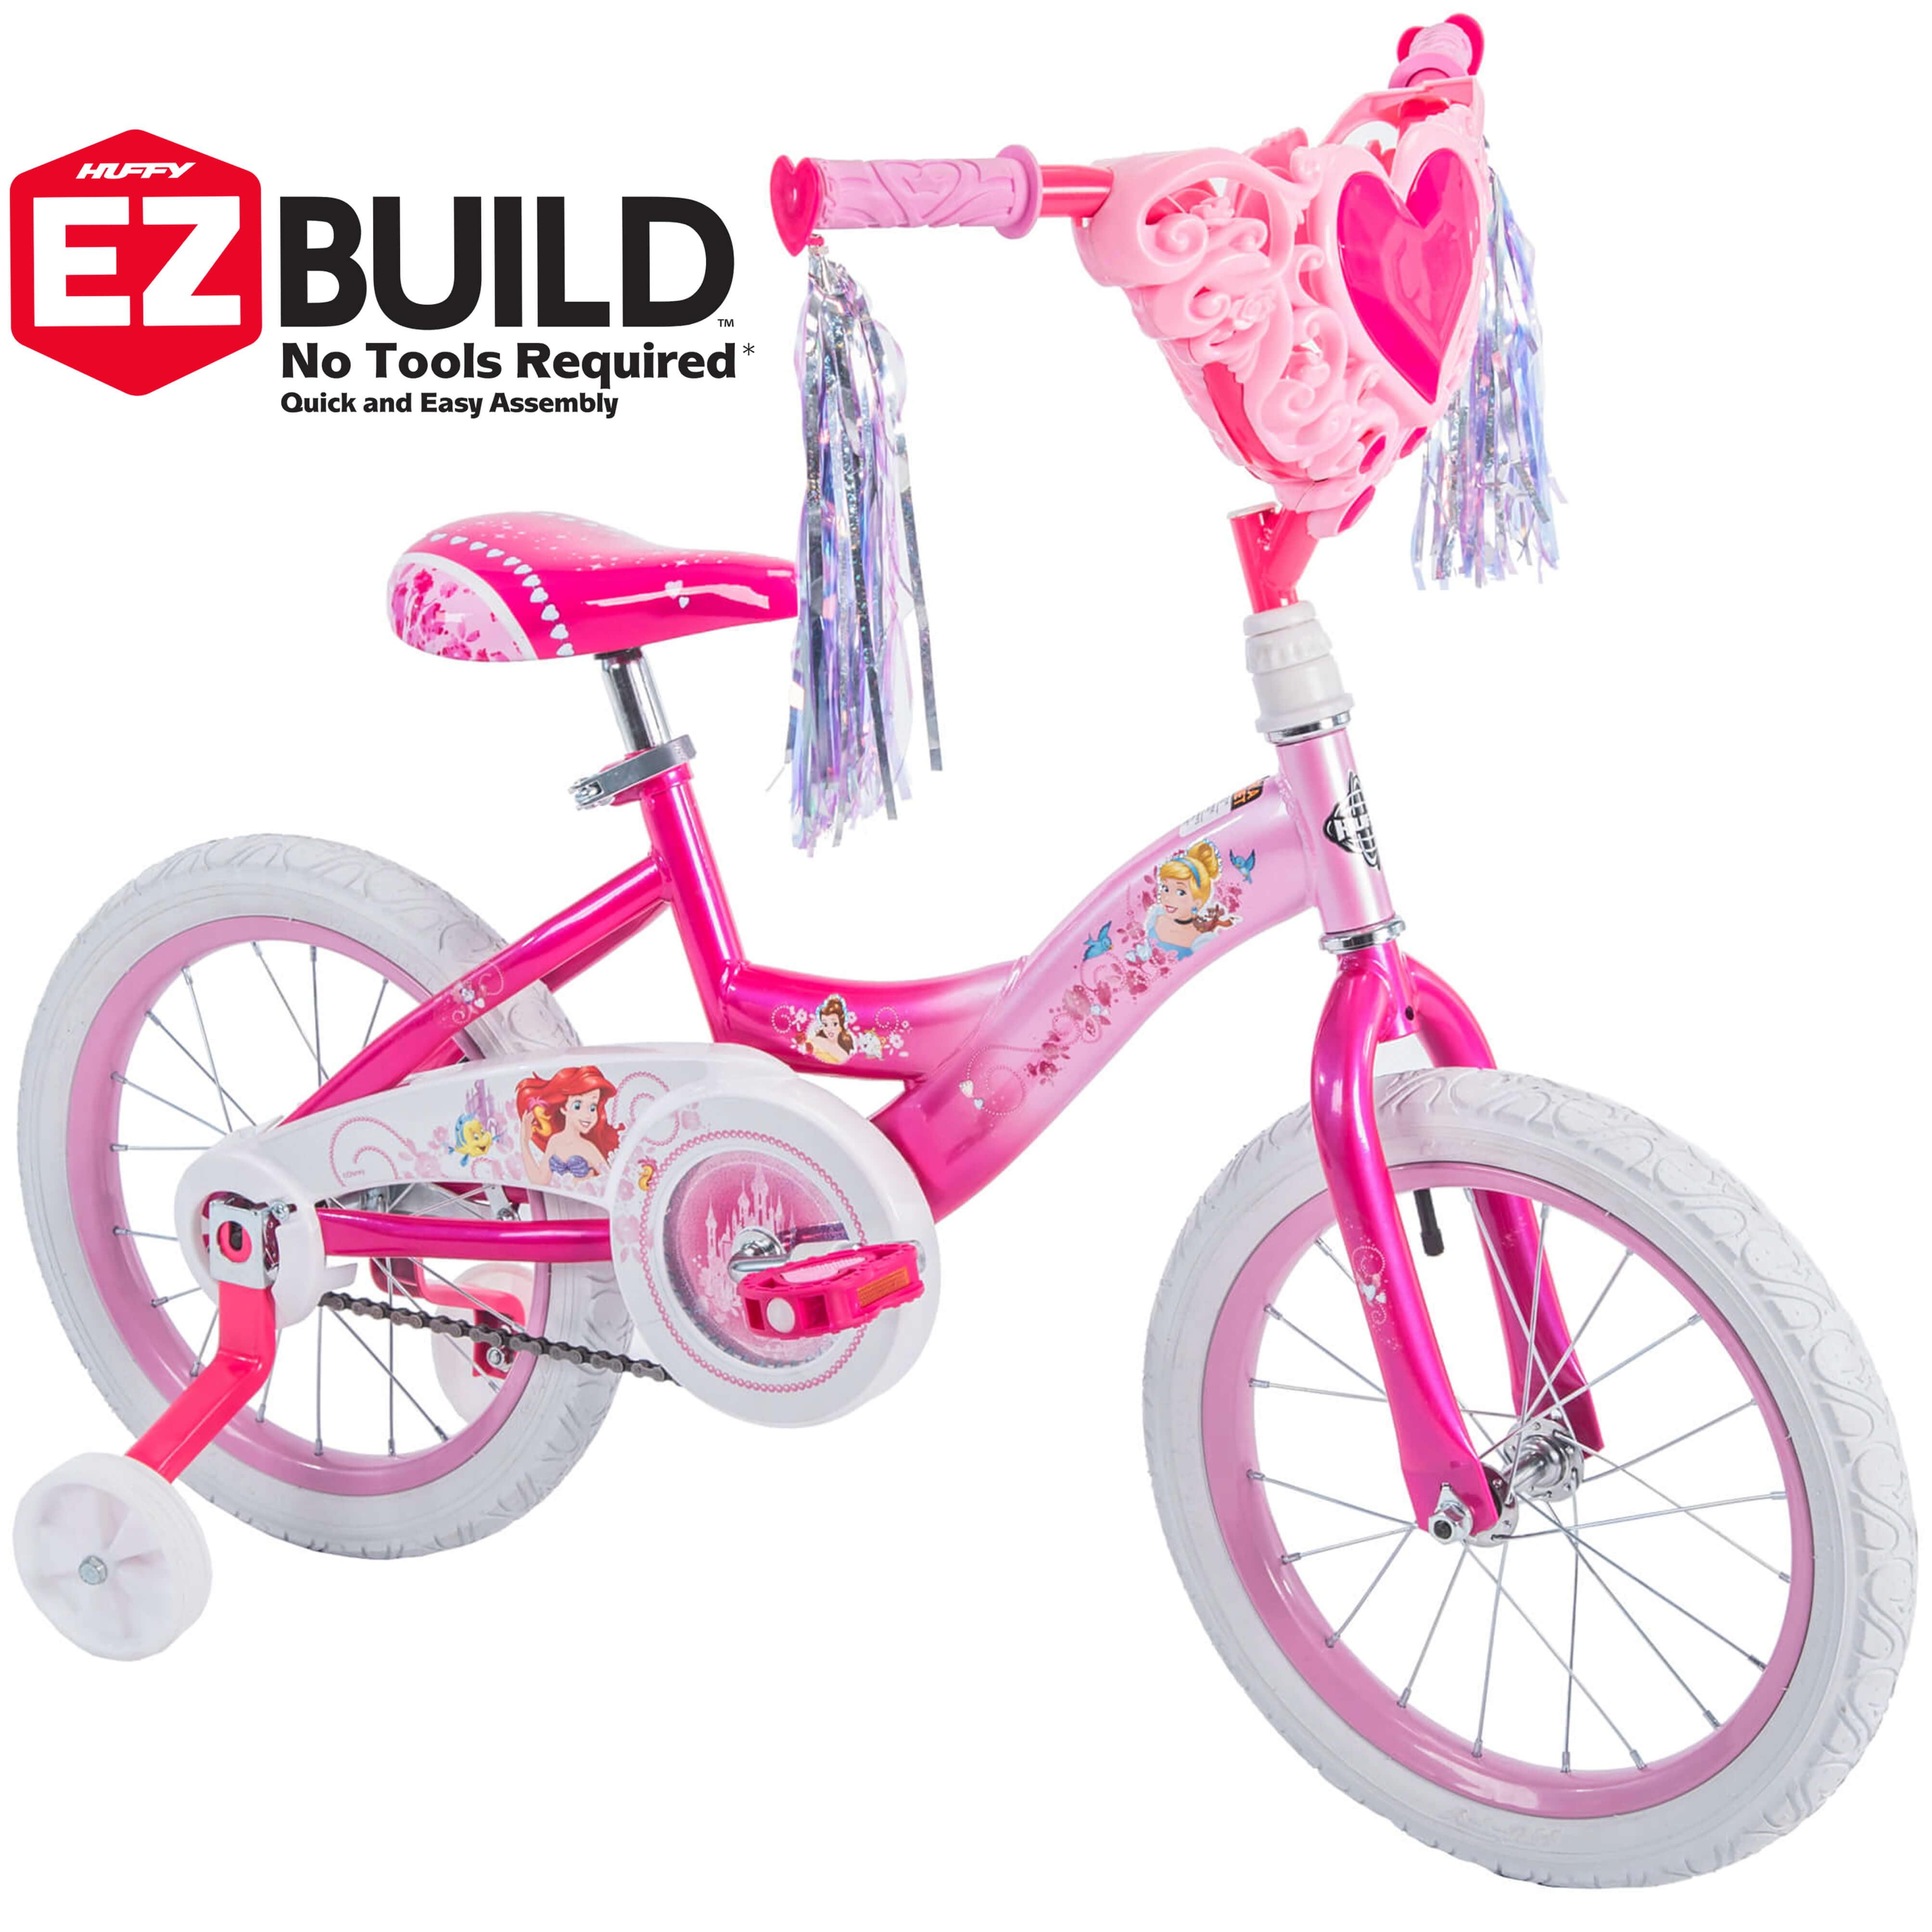 "Disney Princess 16"" Girls' EZ Build Pink Bike, by Huffy by Huffy"